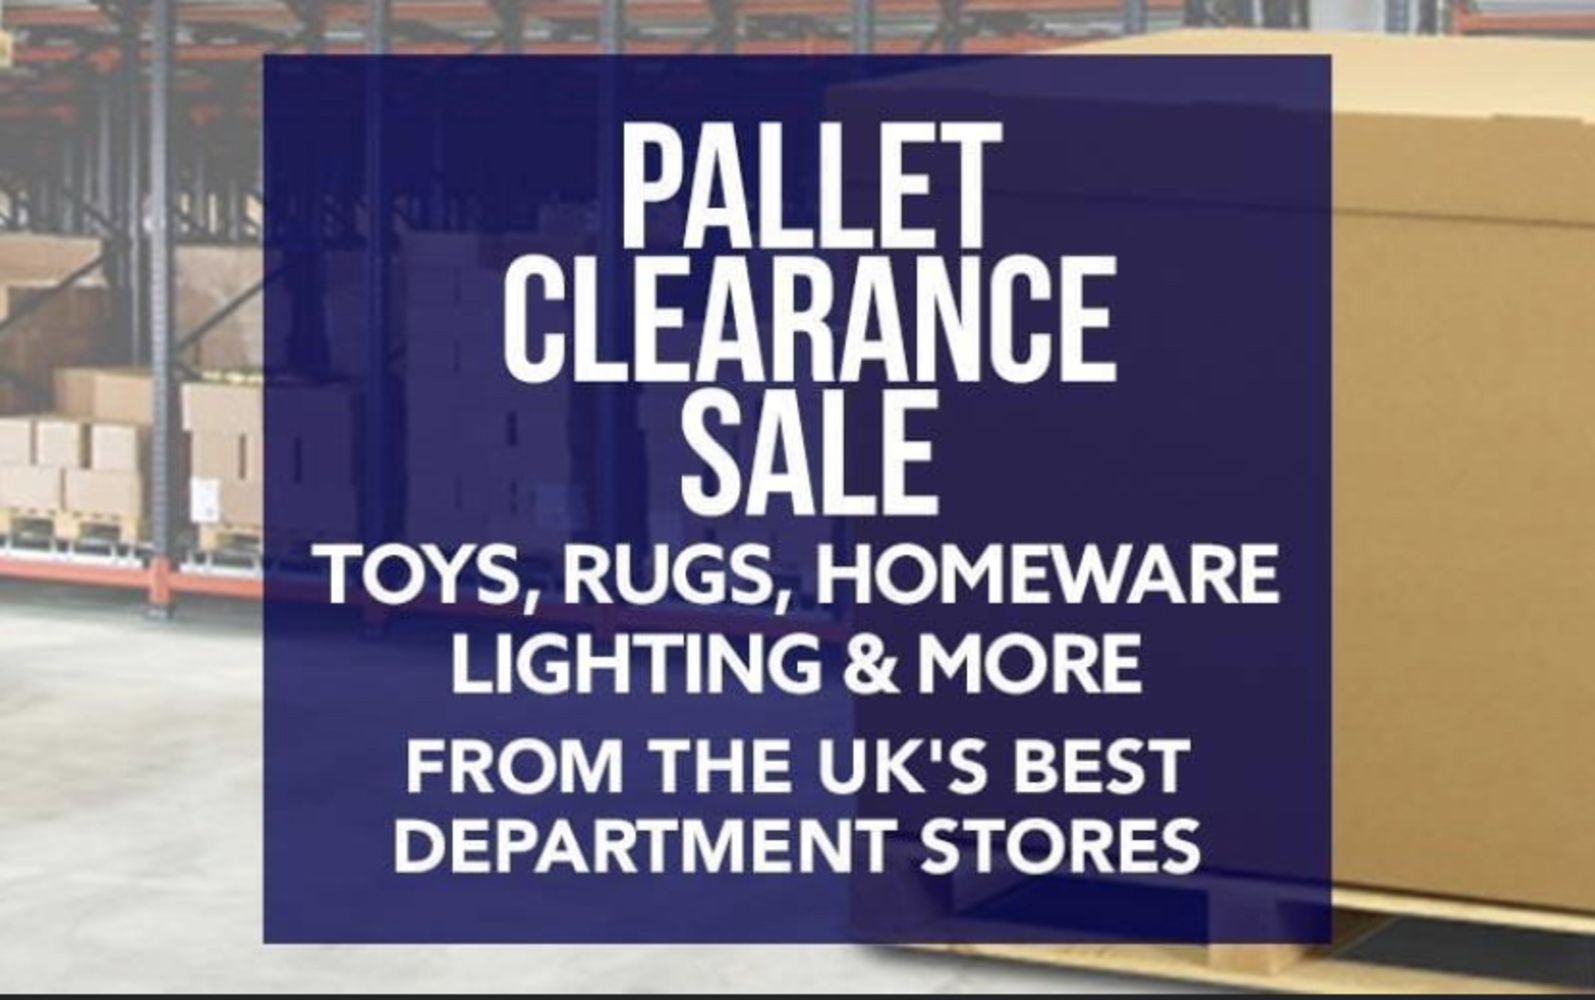 No Reserve - Pallet Clearance Sale! 21st June 2021